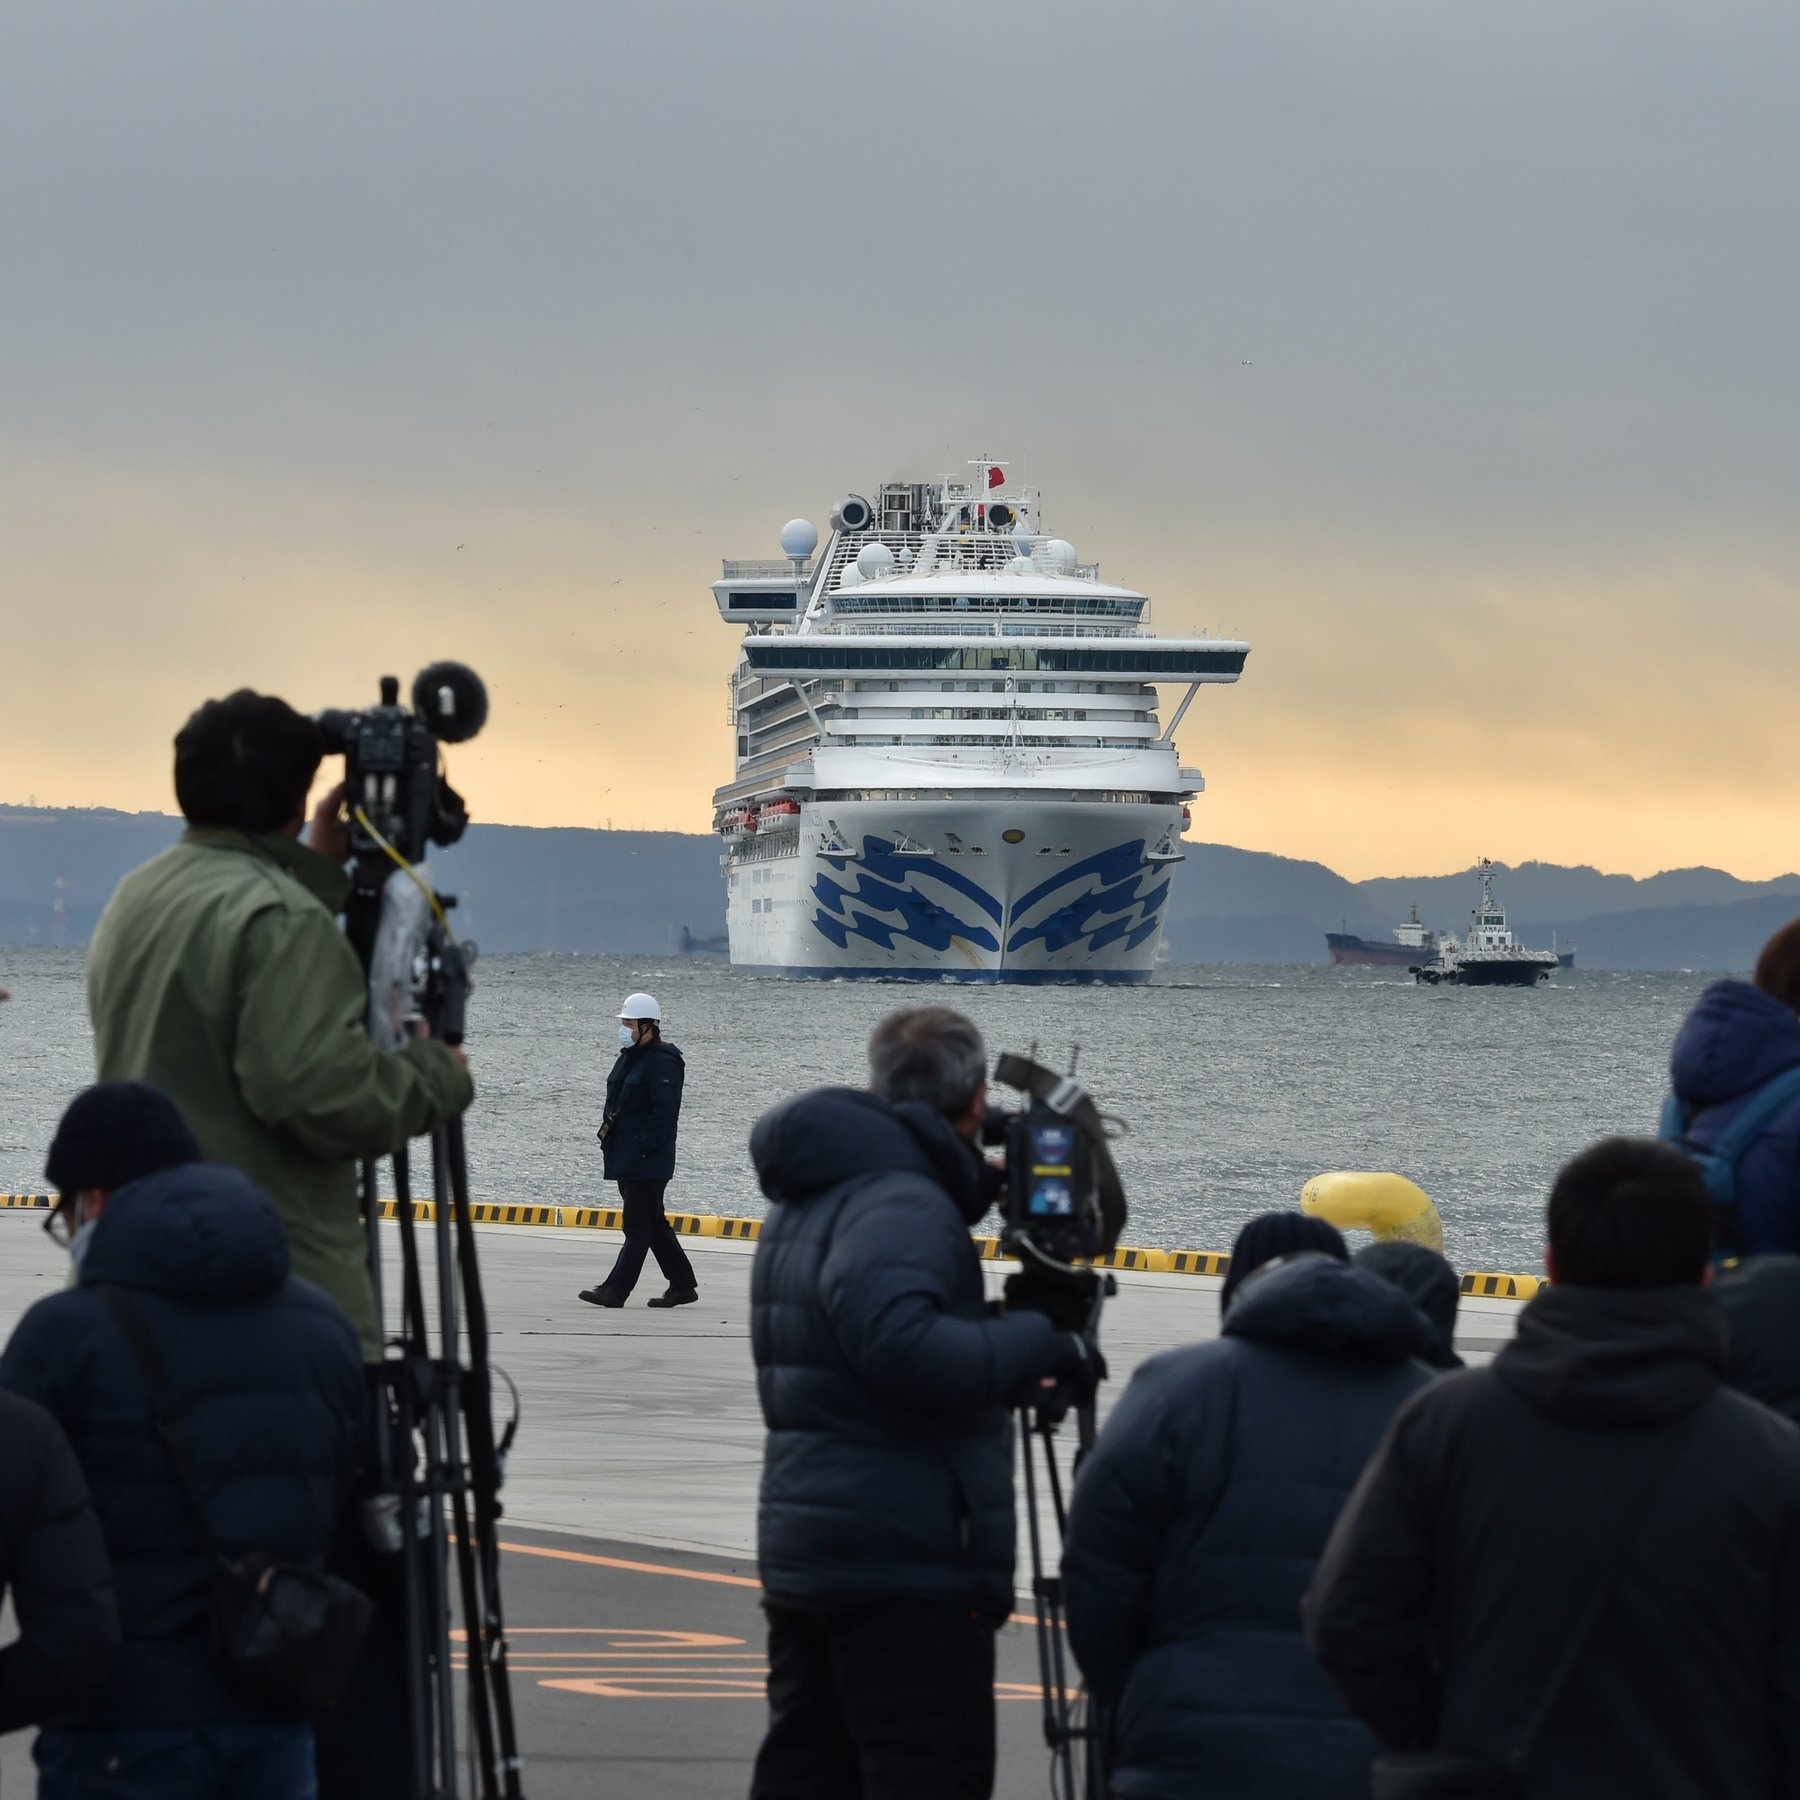 Failures on the Diamond Princess Shadow Another Cruise Ship ...